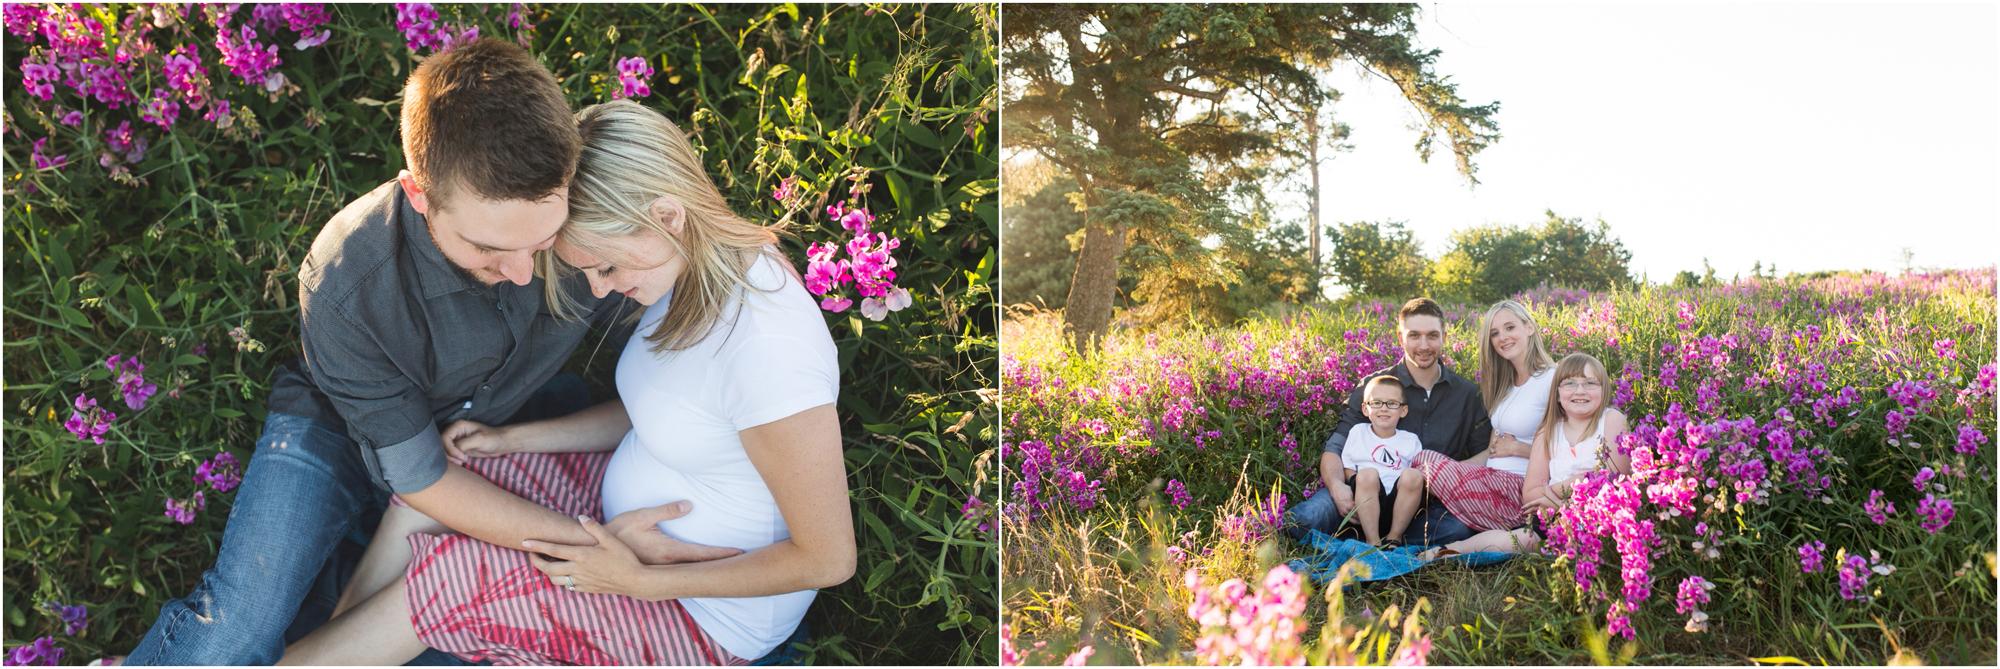 ashley vos photography seattle tacoma area family maternity newborn photographer_0468.jpg